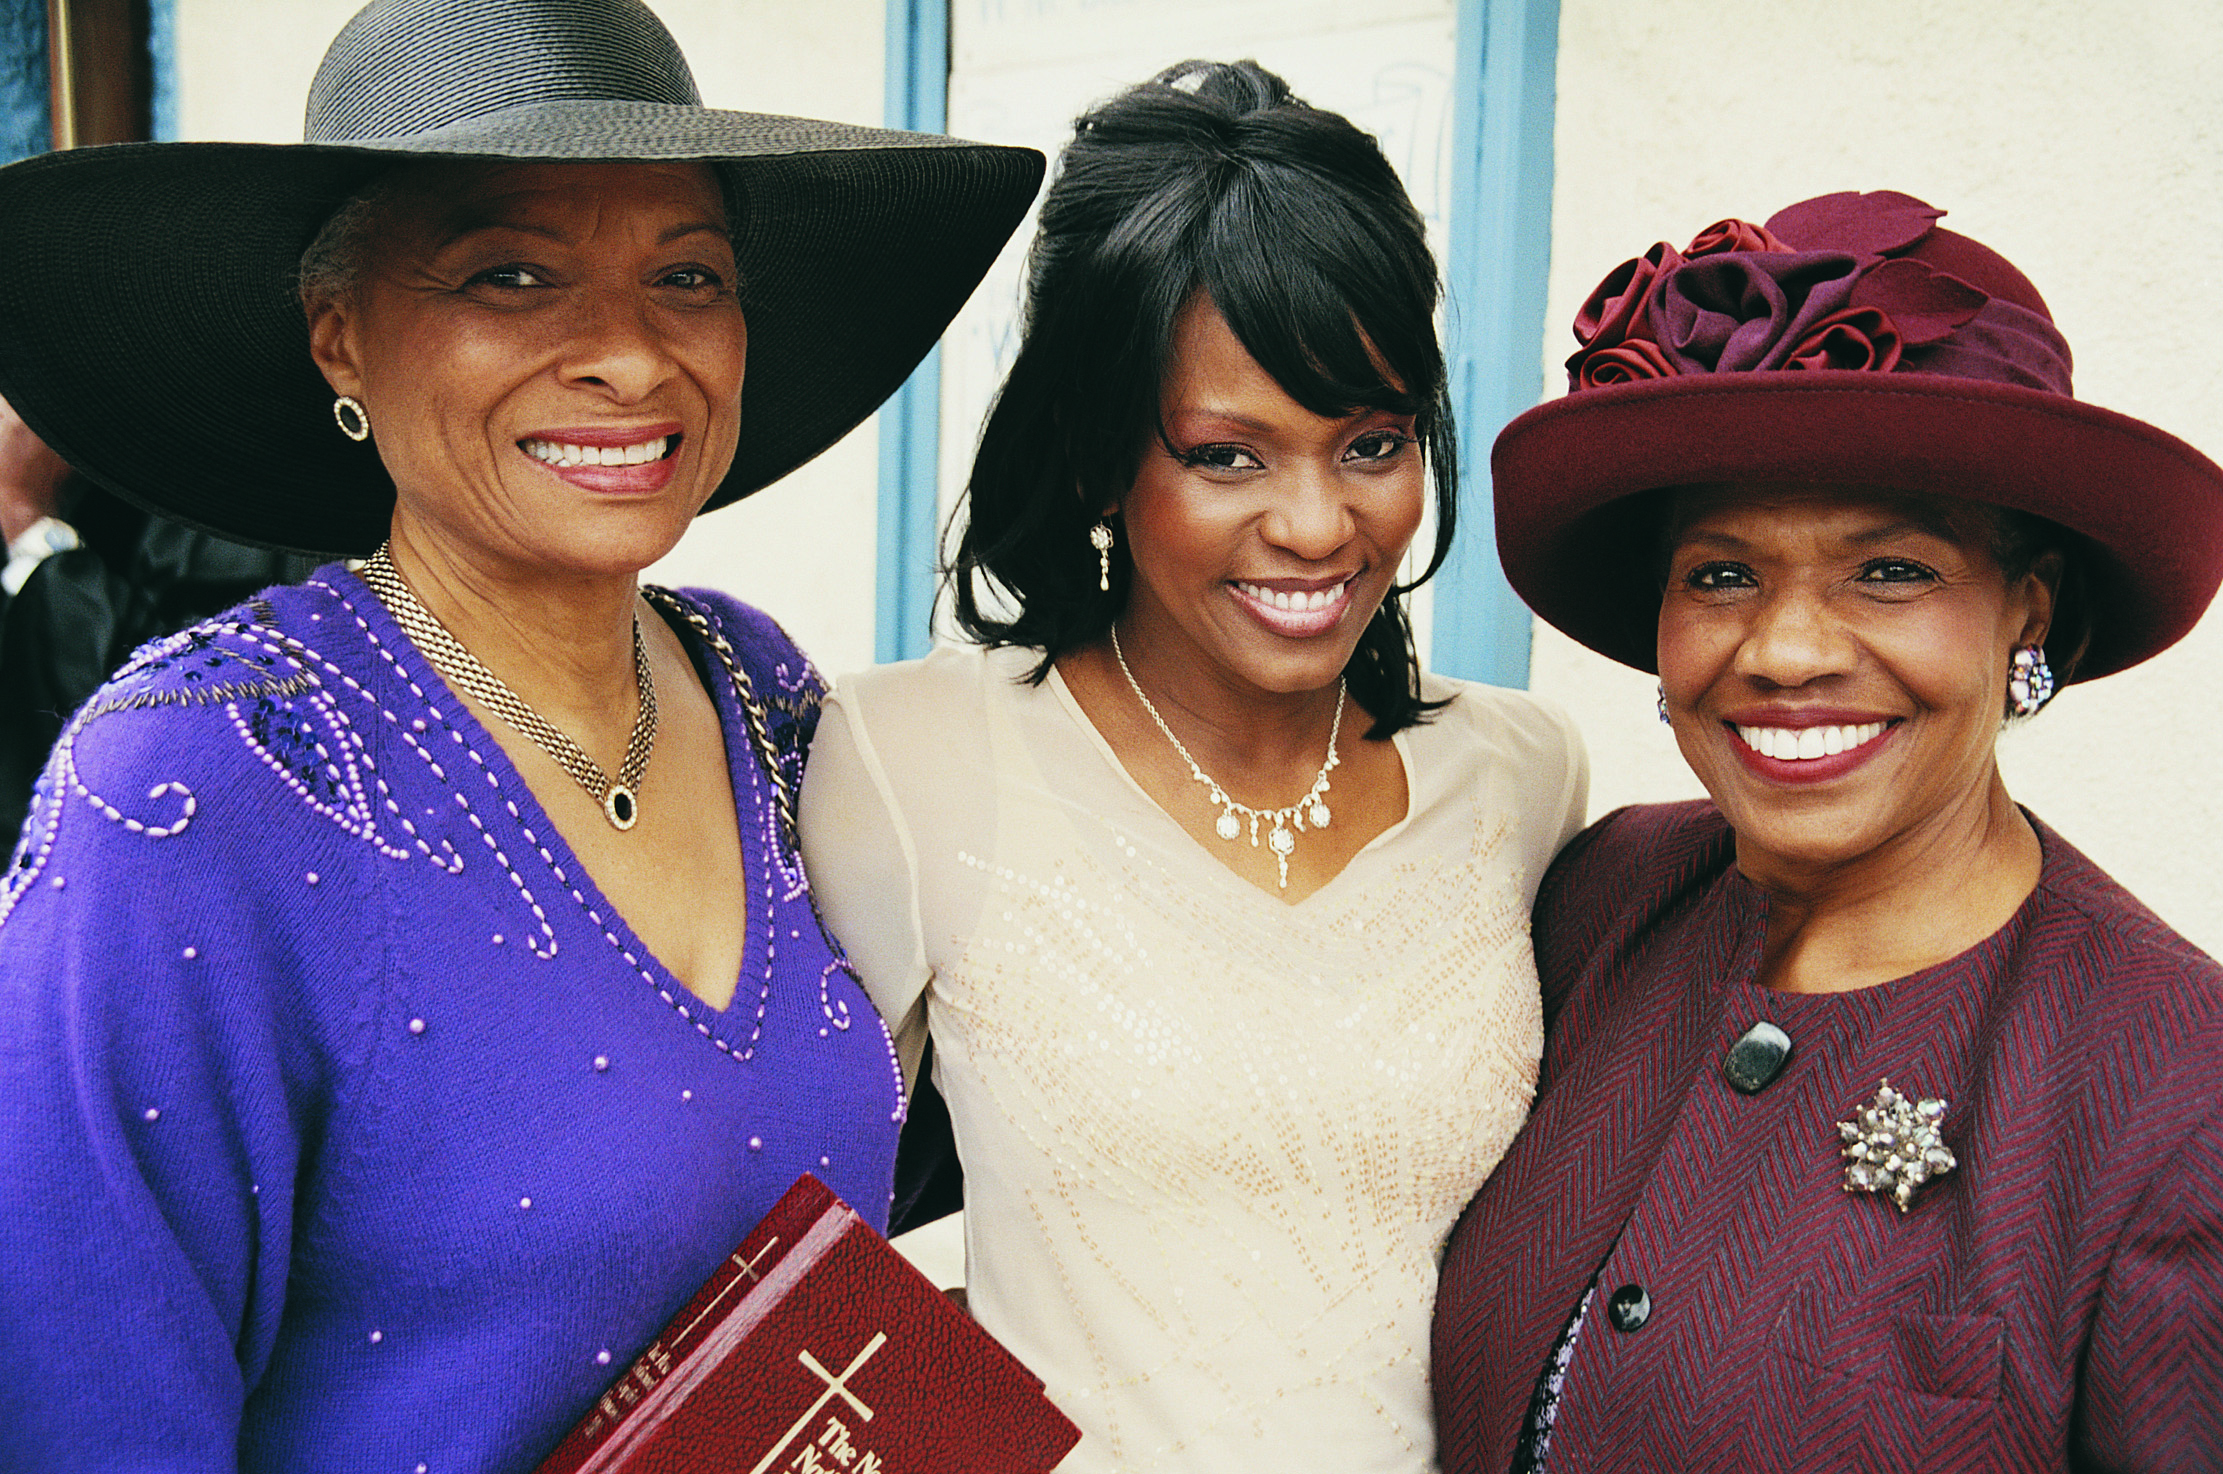 United pentecostal church dress code